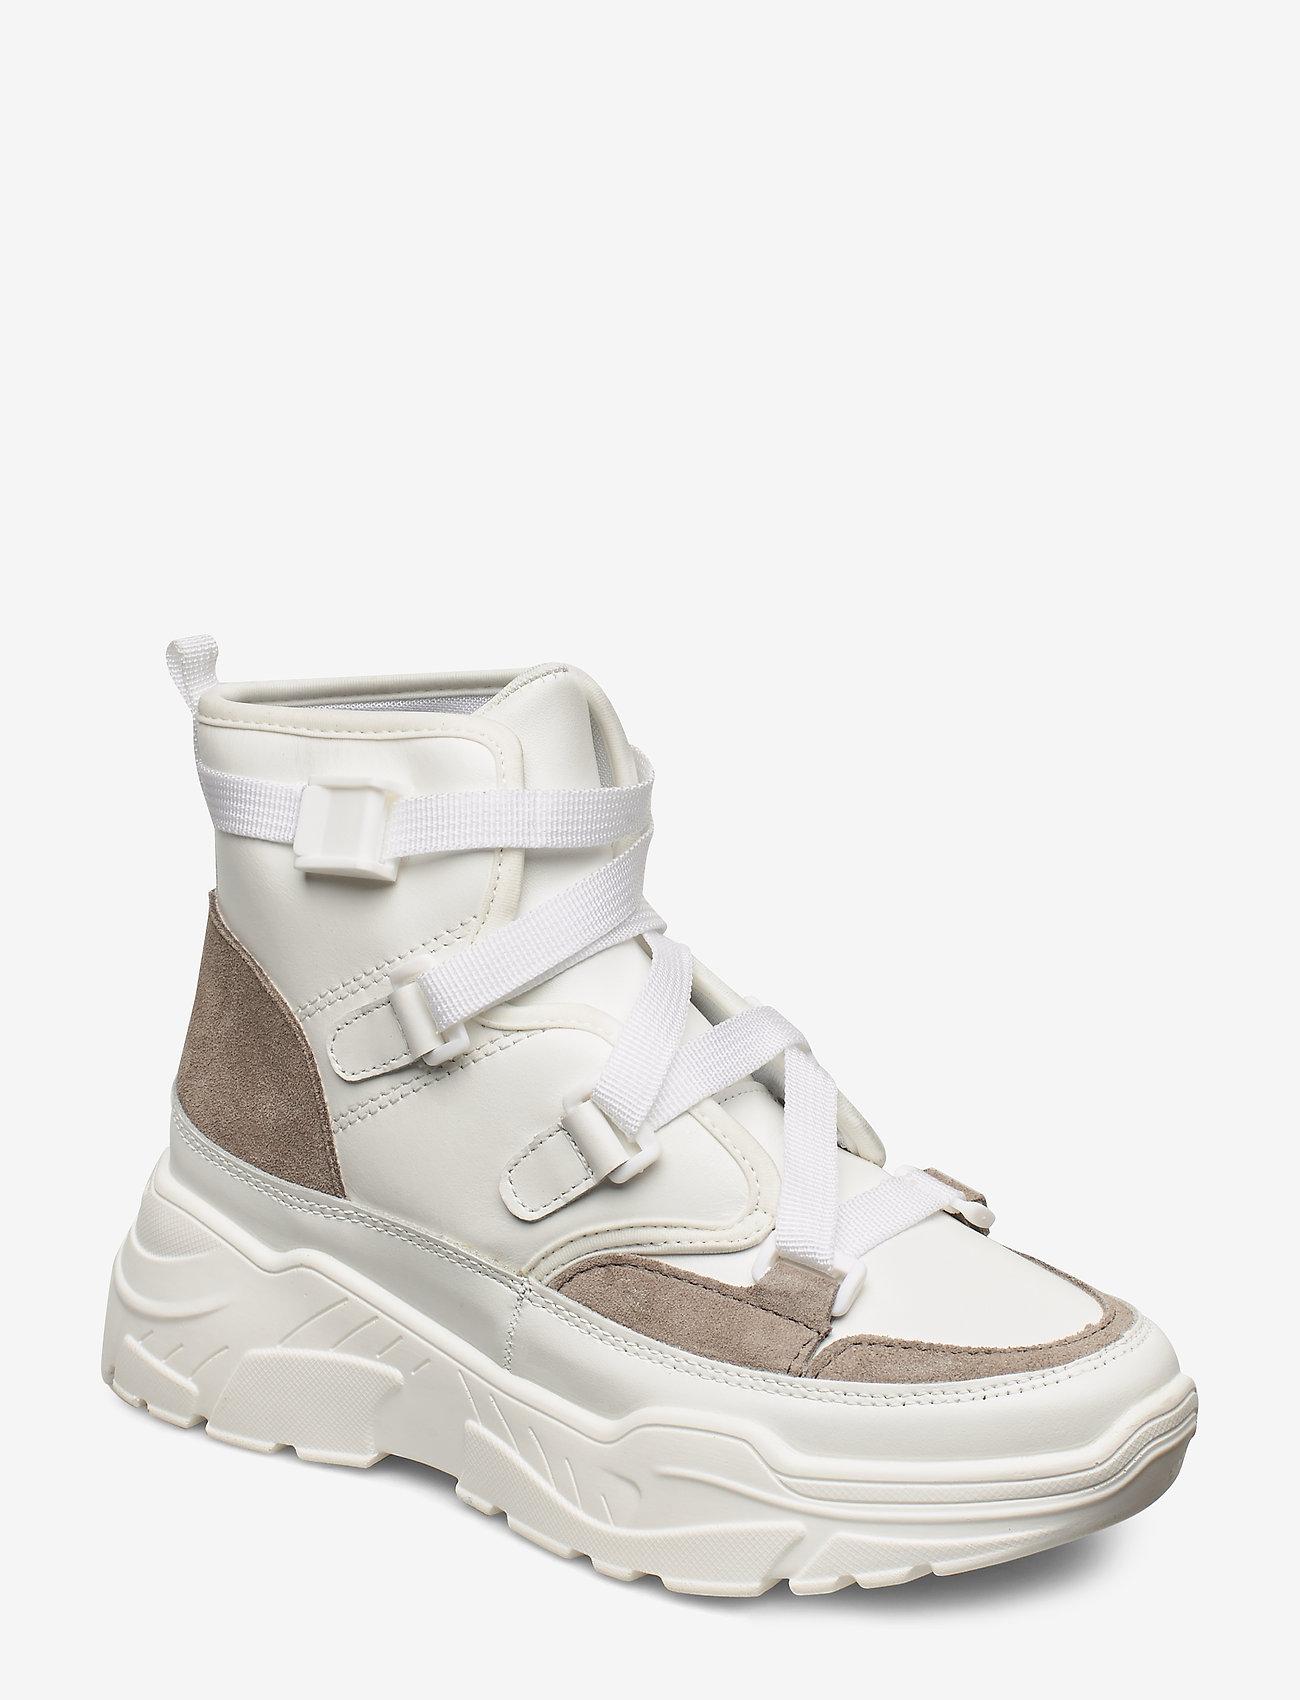 Sofie Schnoor - Shoe - baskets épaisses - white - 0